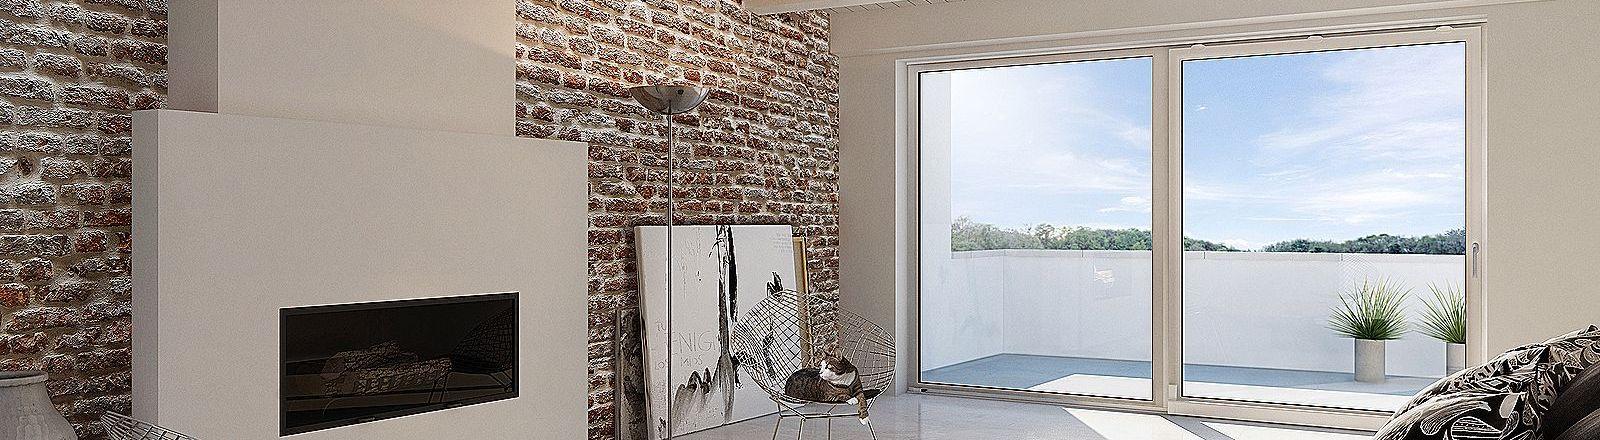 energooszczędne okna de